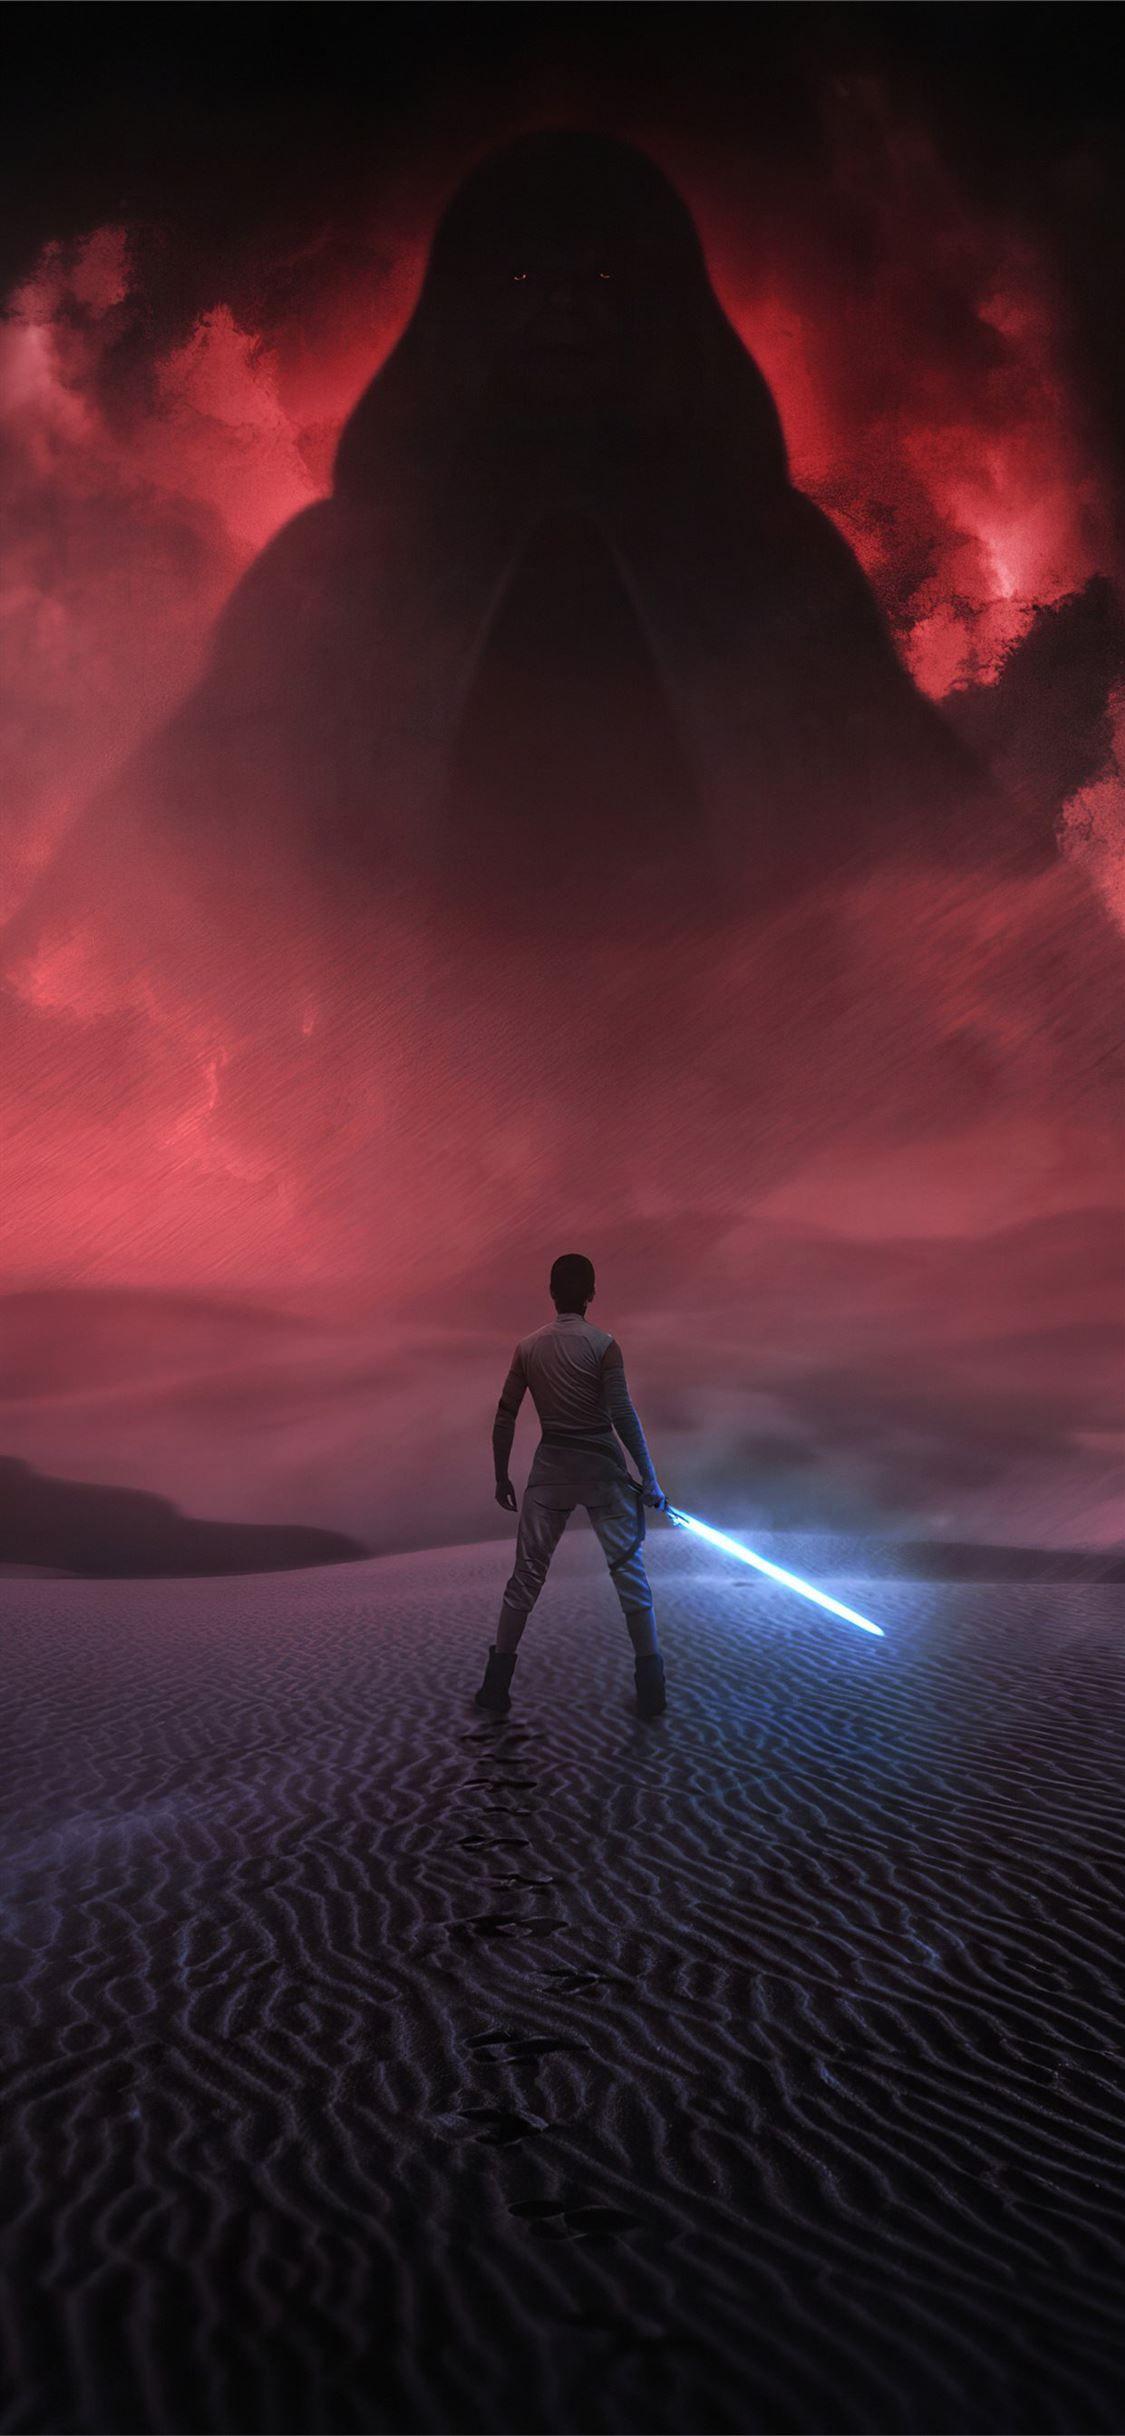 Star Wars The Rise Of Skywalker 4k Rey Starwarstheriseofskywalker Rey Movies 2019movies Starwars 4k Iphone1 In 2020 Star Wars Star Wars Wallpaper Star Wars Film